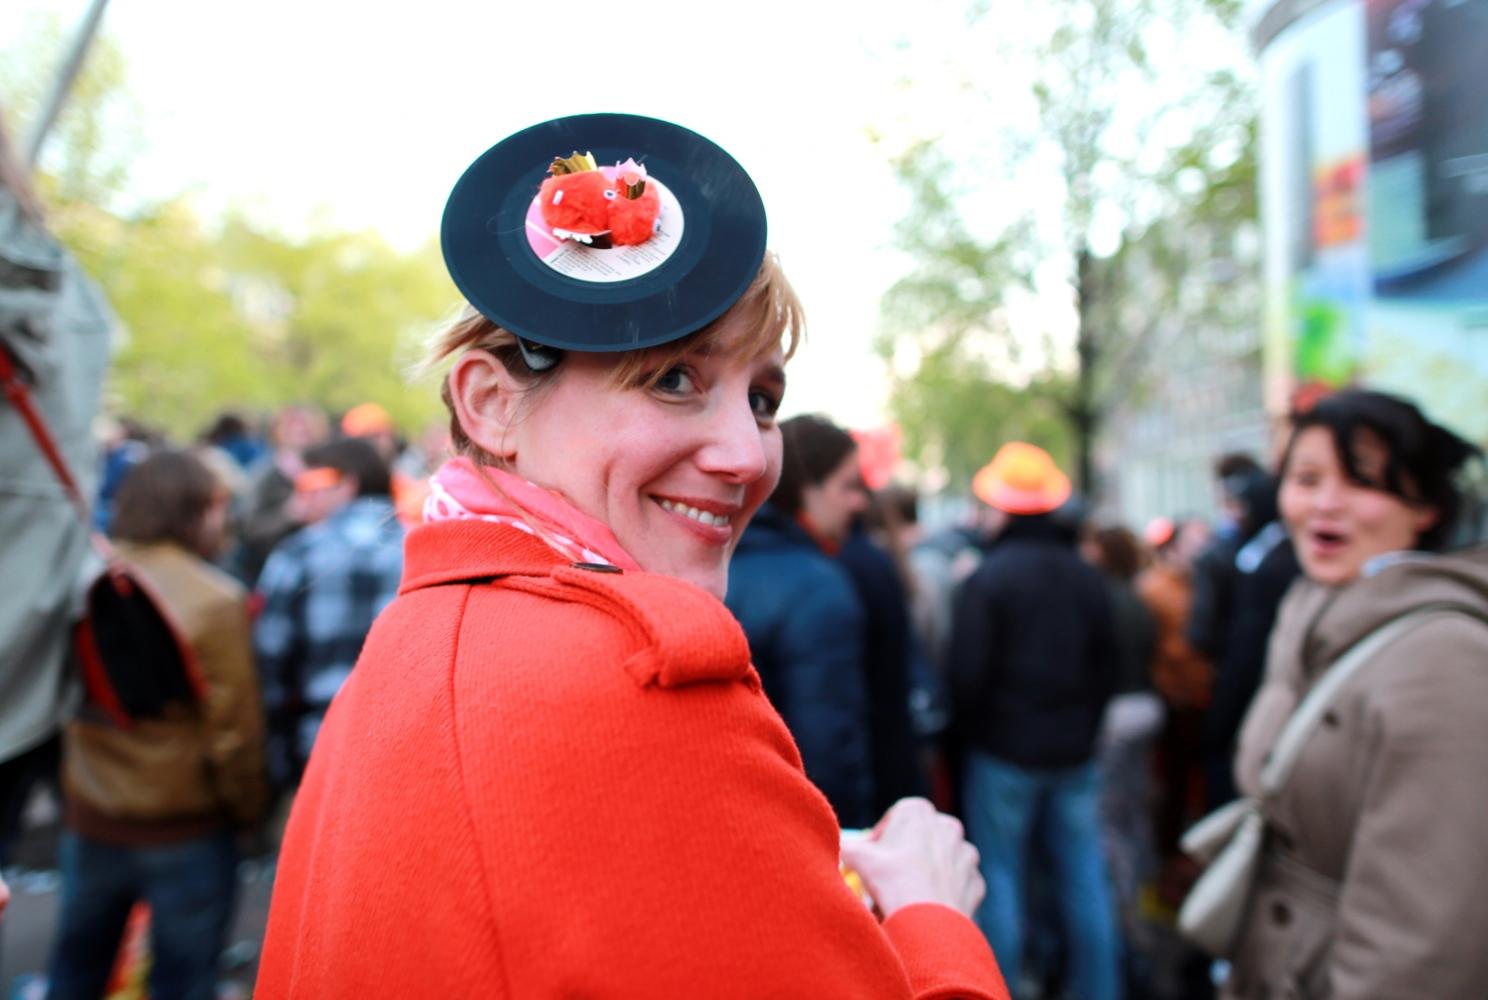 Ute Kohlmanncelebrates Koningsdag or King's Day in Amsterdam.